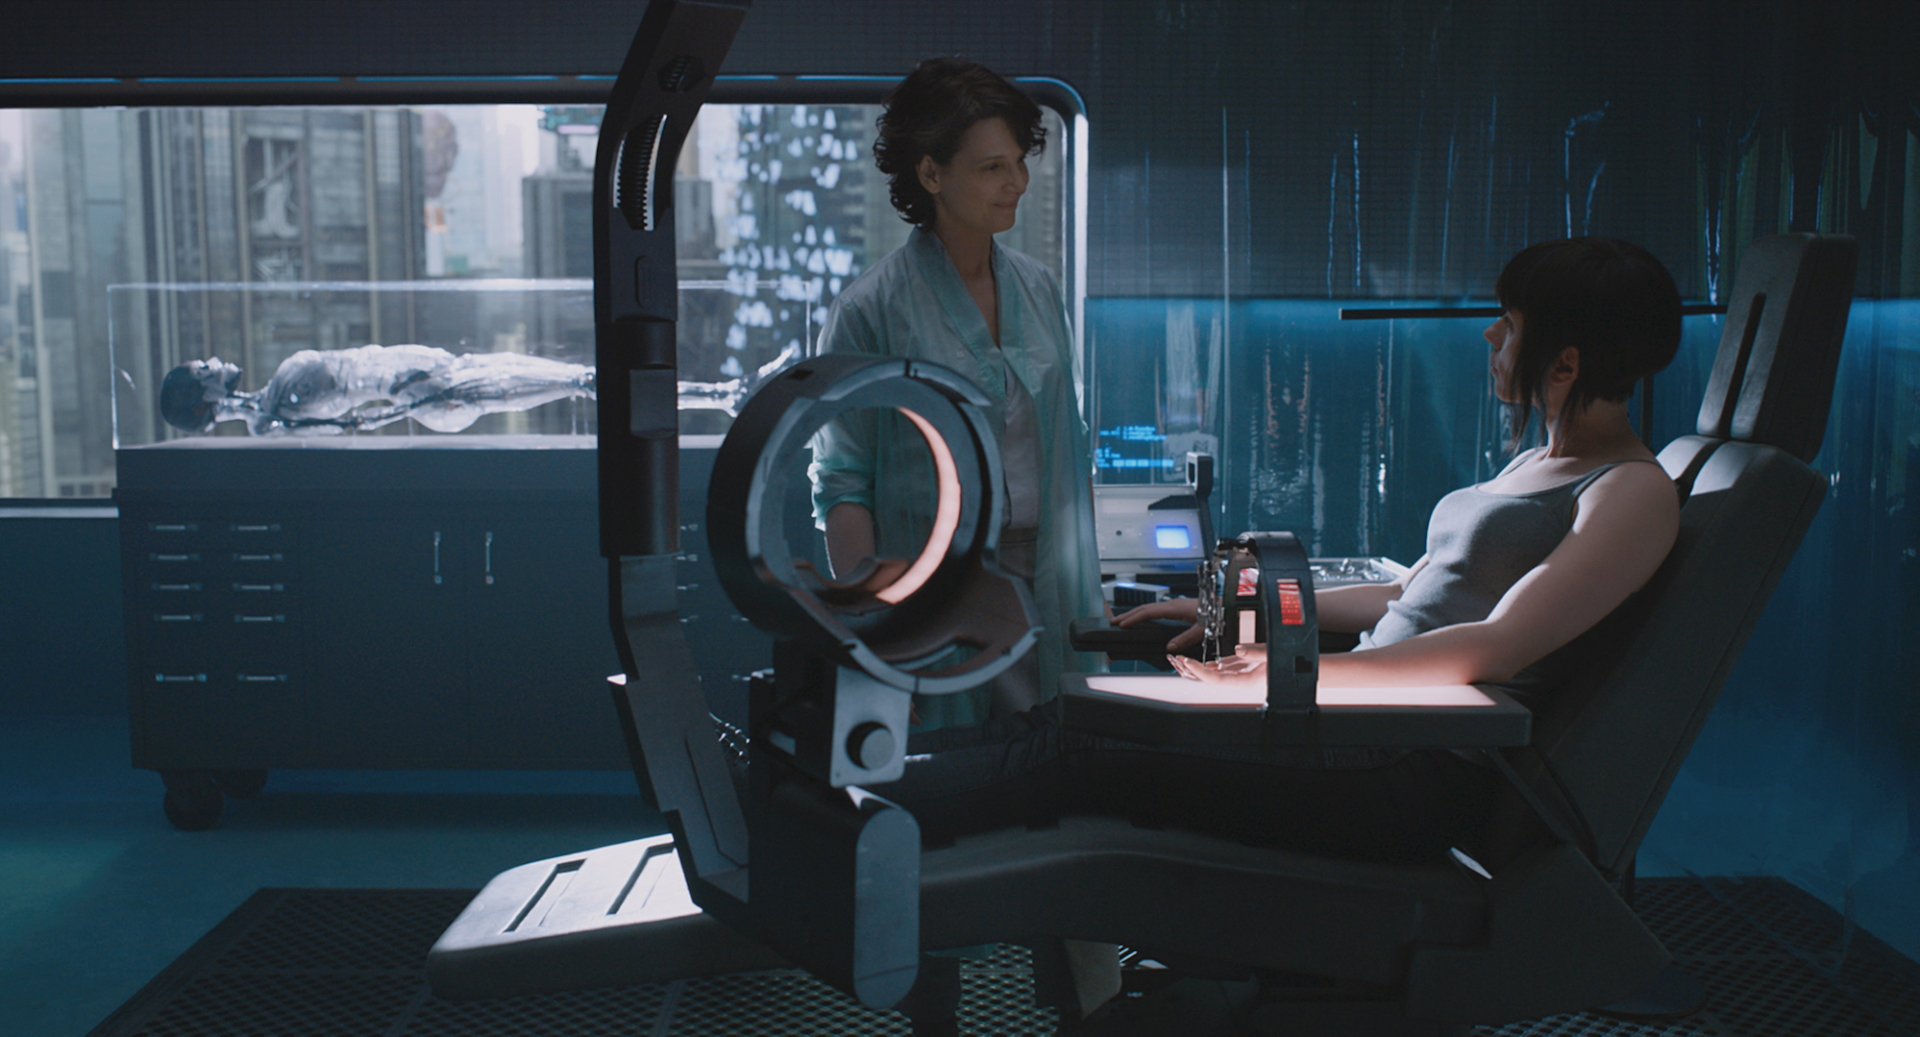 Ghost in the Shell con Scarlett Johansson, foto